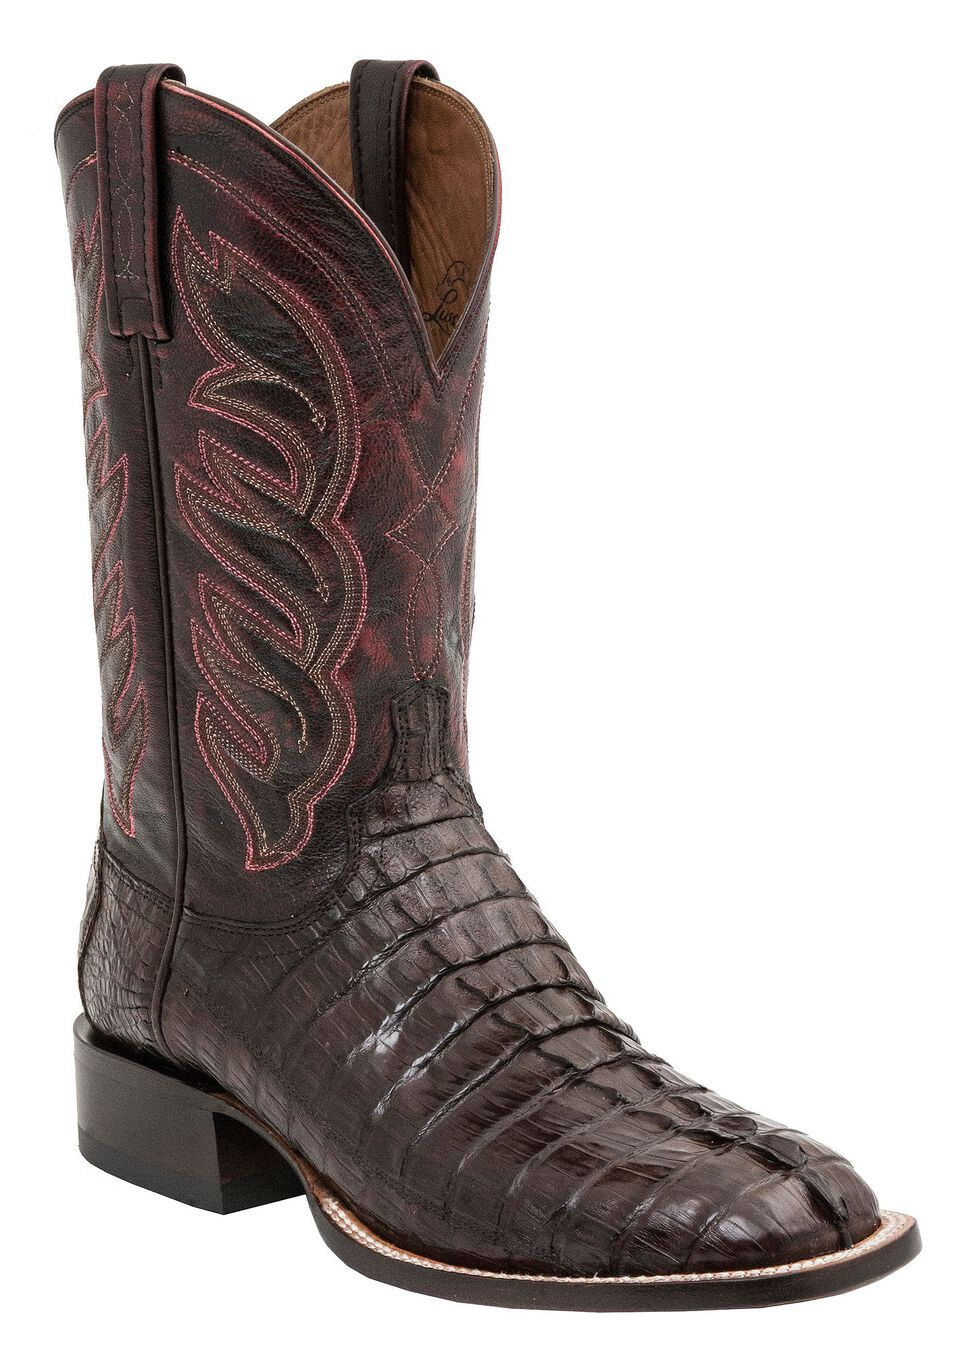 Lucchese 1883 Handmade Landon Hornback Caiman Tail Cowboy Boots - Square Toe, Barrel Brn, hi-res